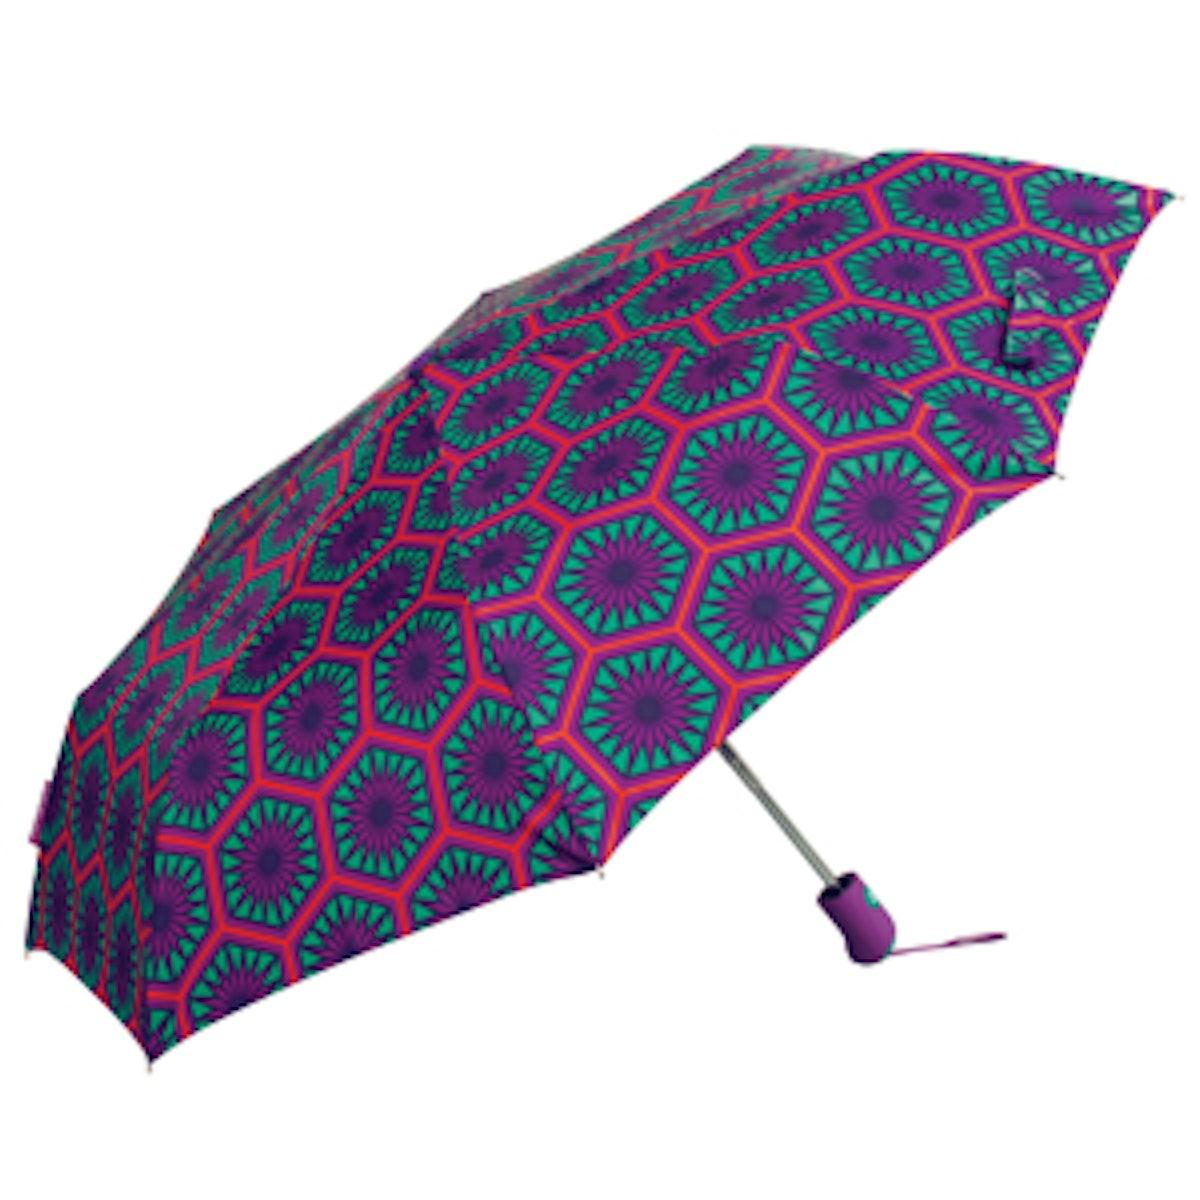 Positano Hexagons Umbrella